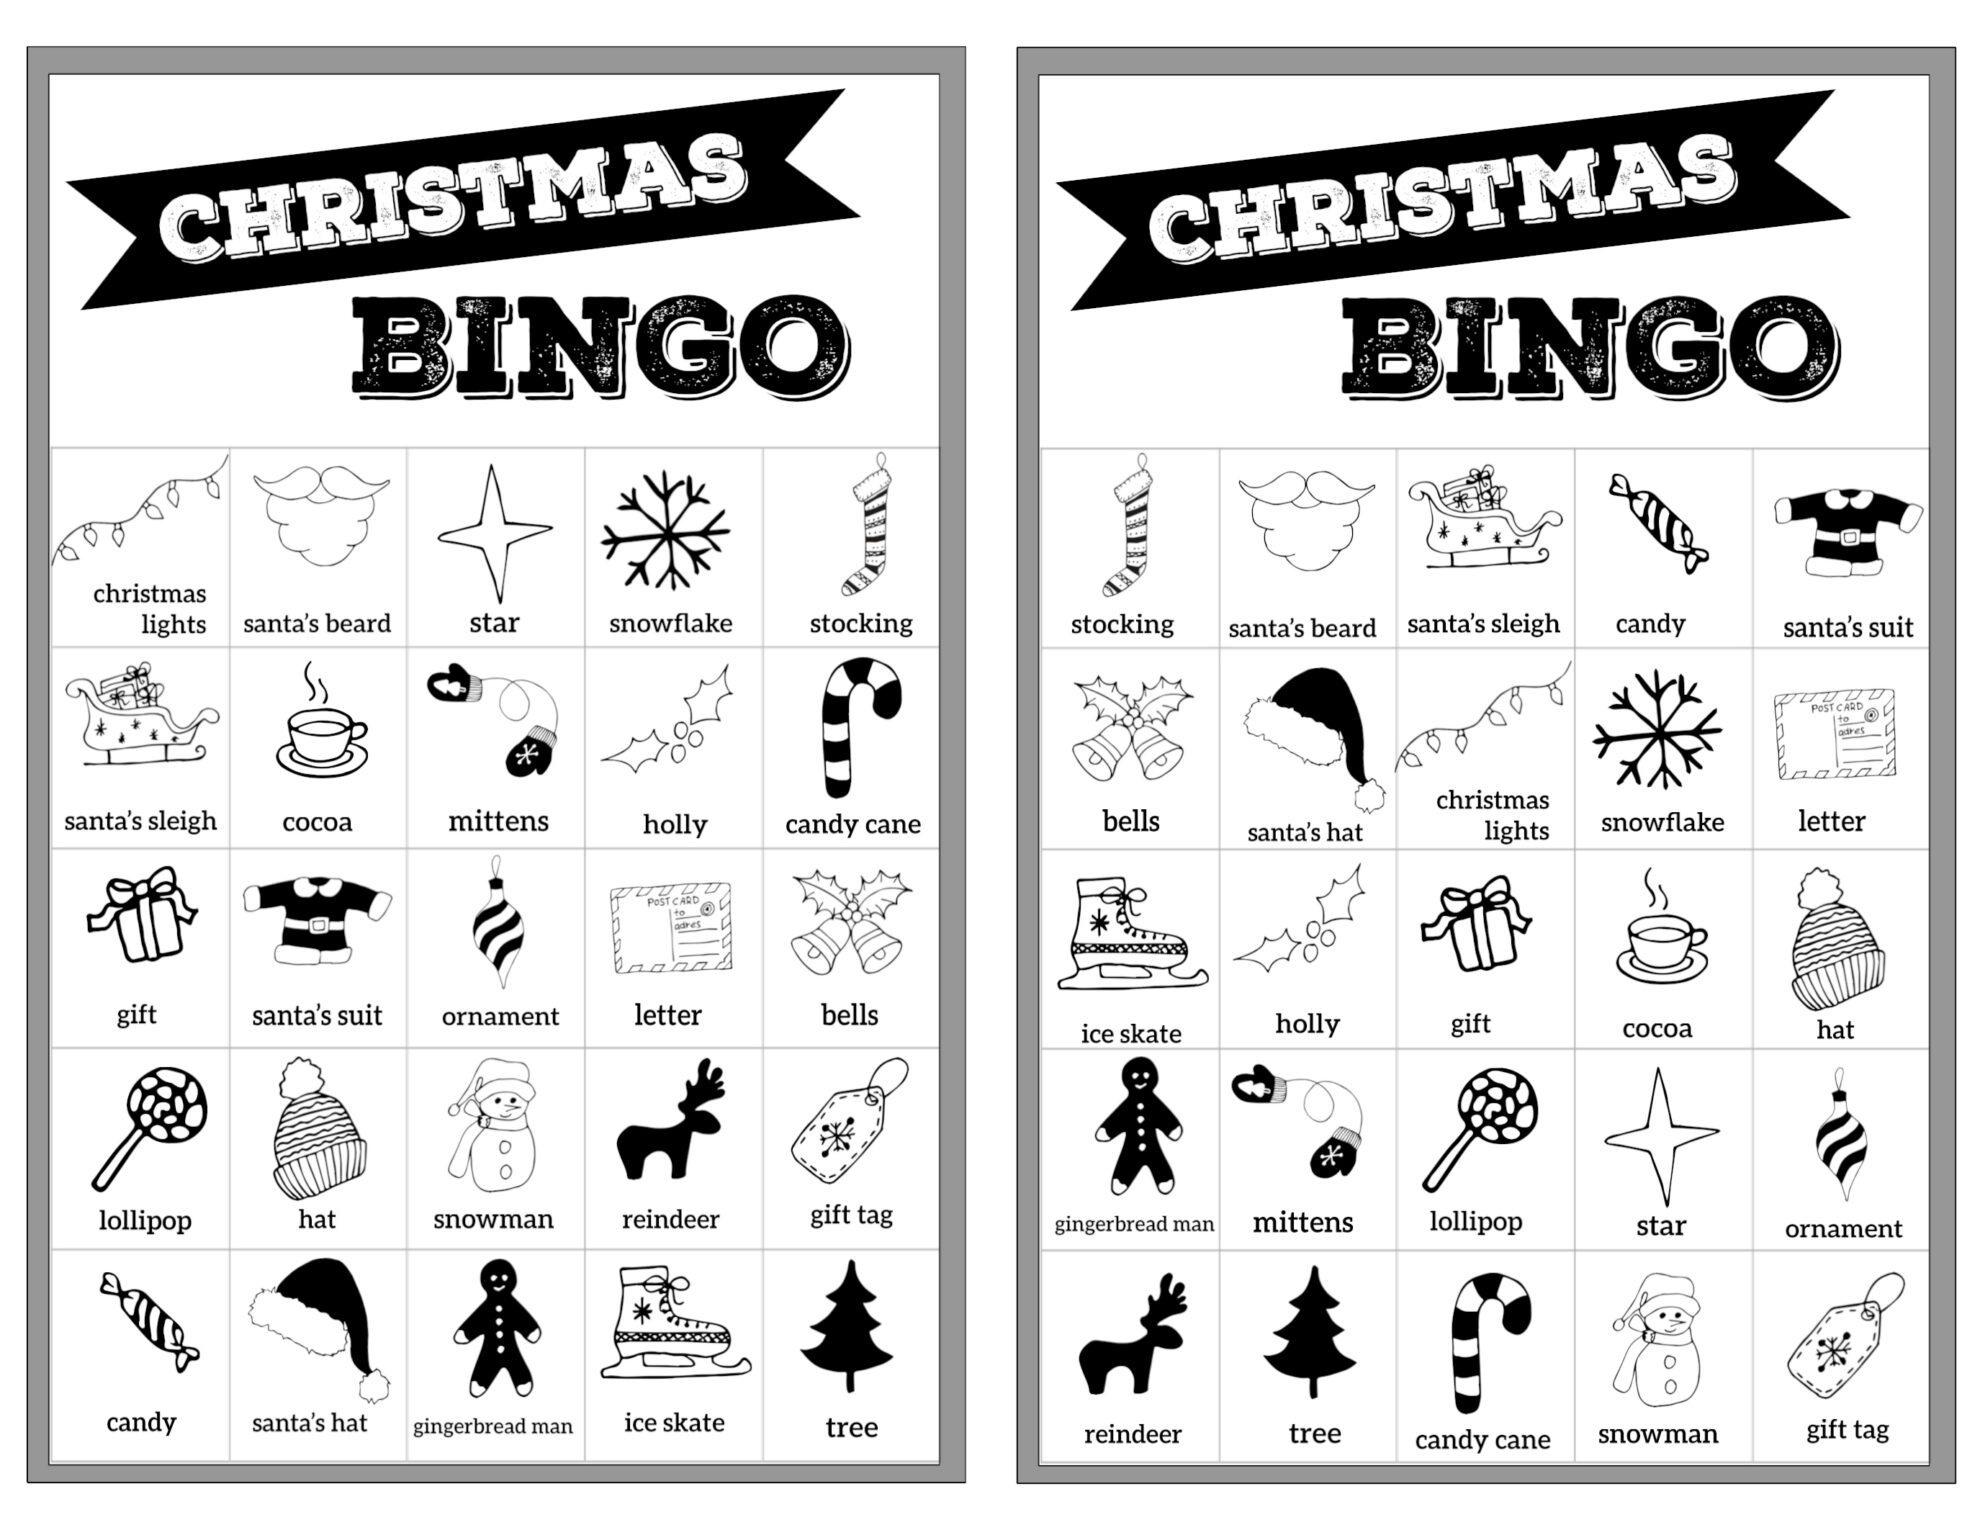 Free Christmas Bingo Printable Cards - Paper Trail Design - Free Printable Christmas Bingo Cards